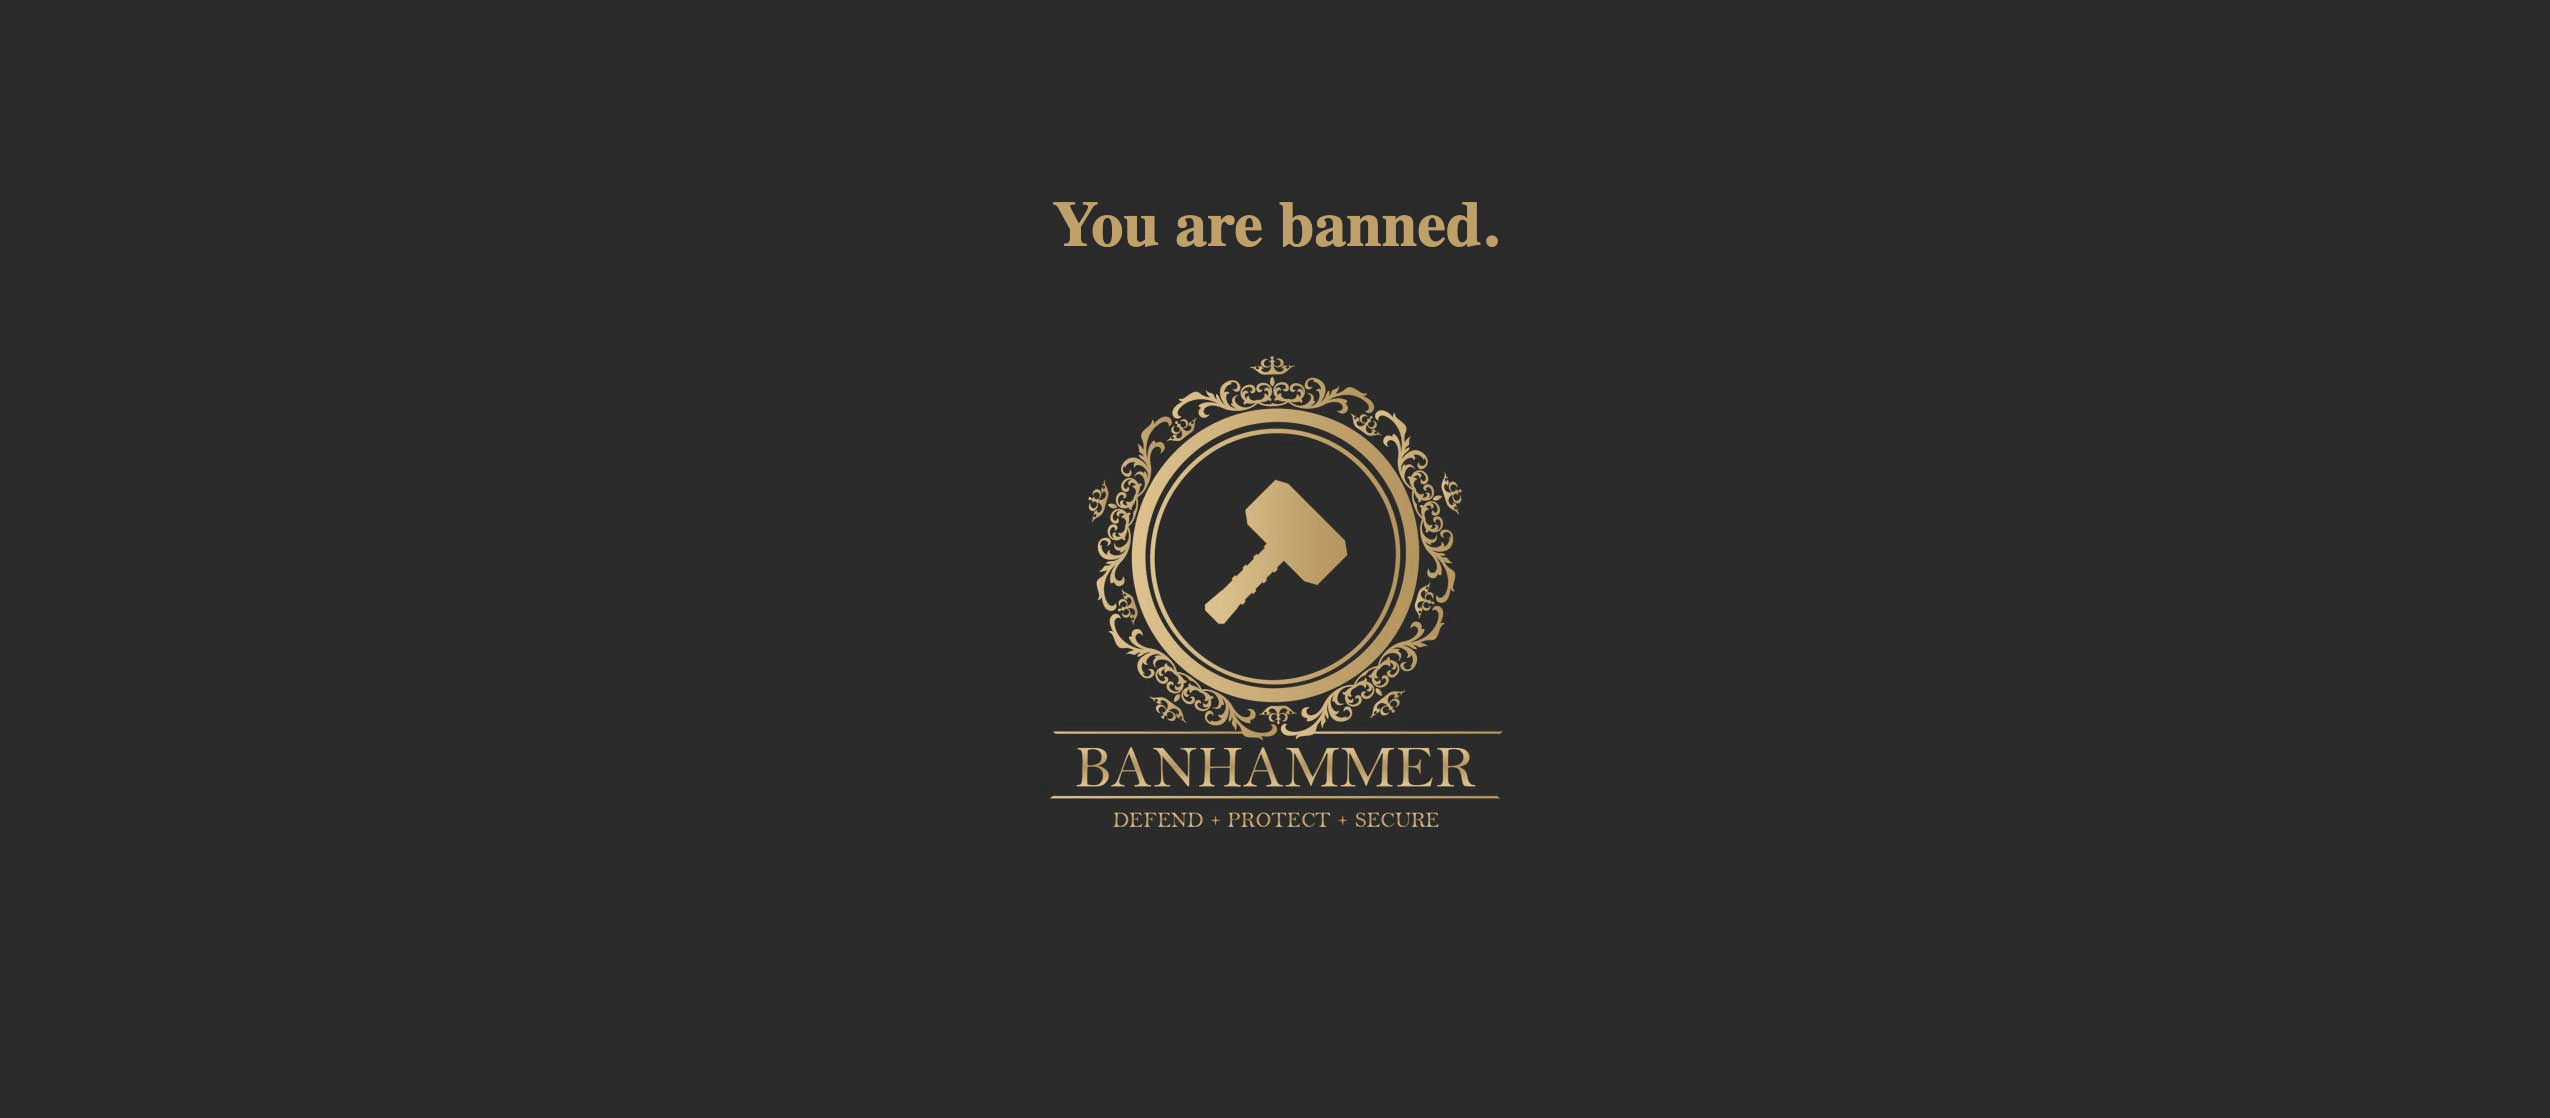 Banhammer Pro - Default Banned Message